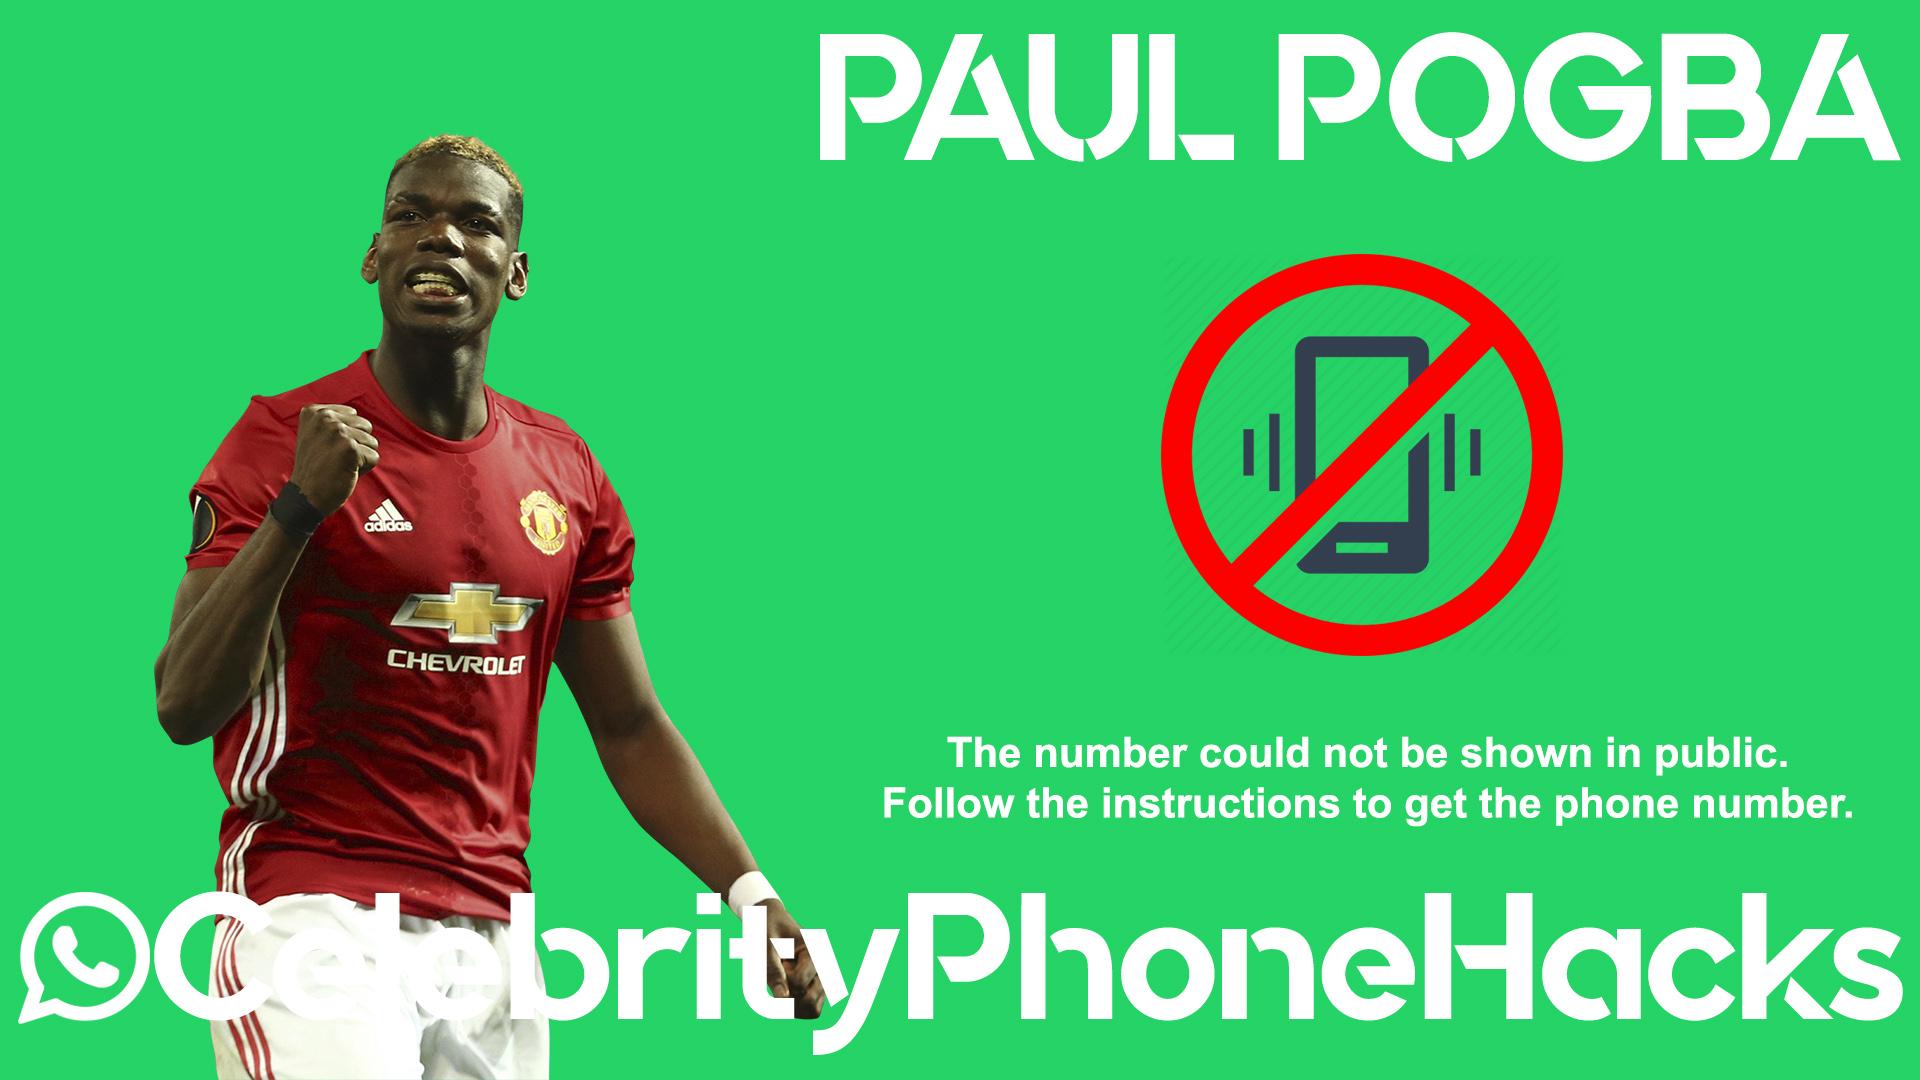 Paul Pogba real phone number 2019 whatsapp hacked leaked